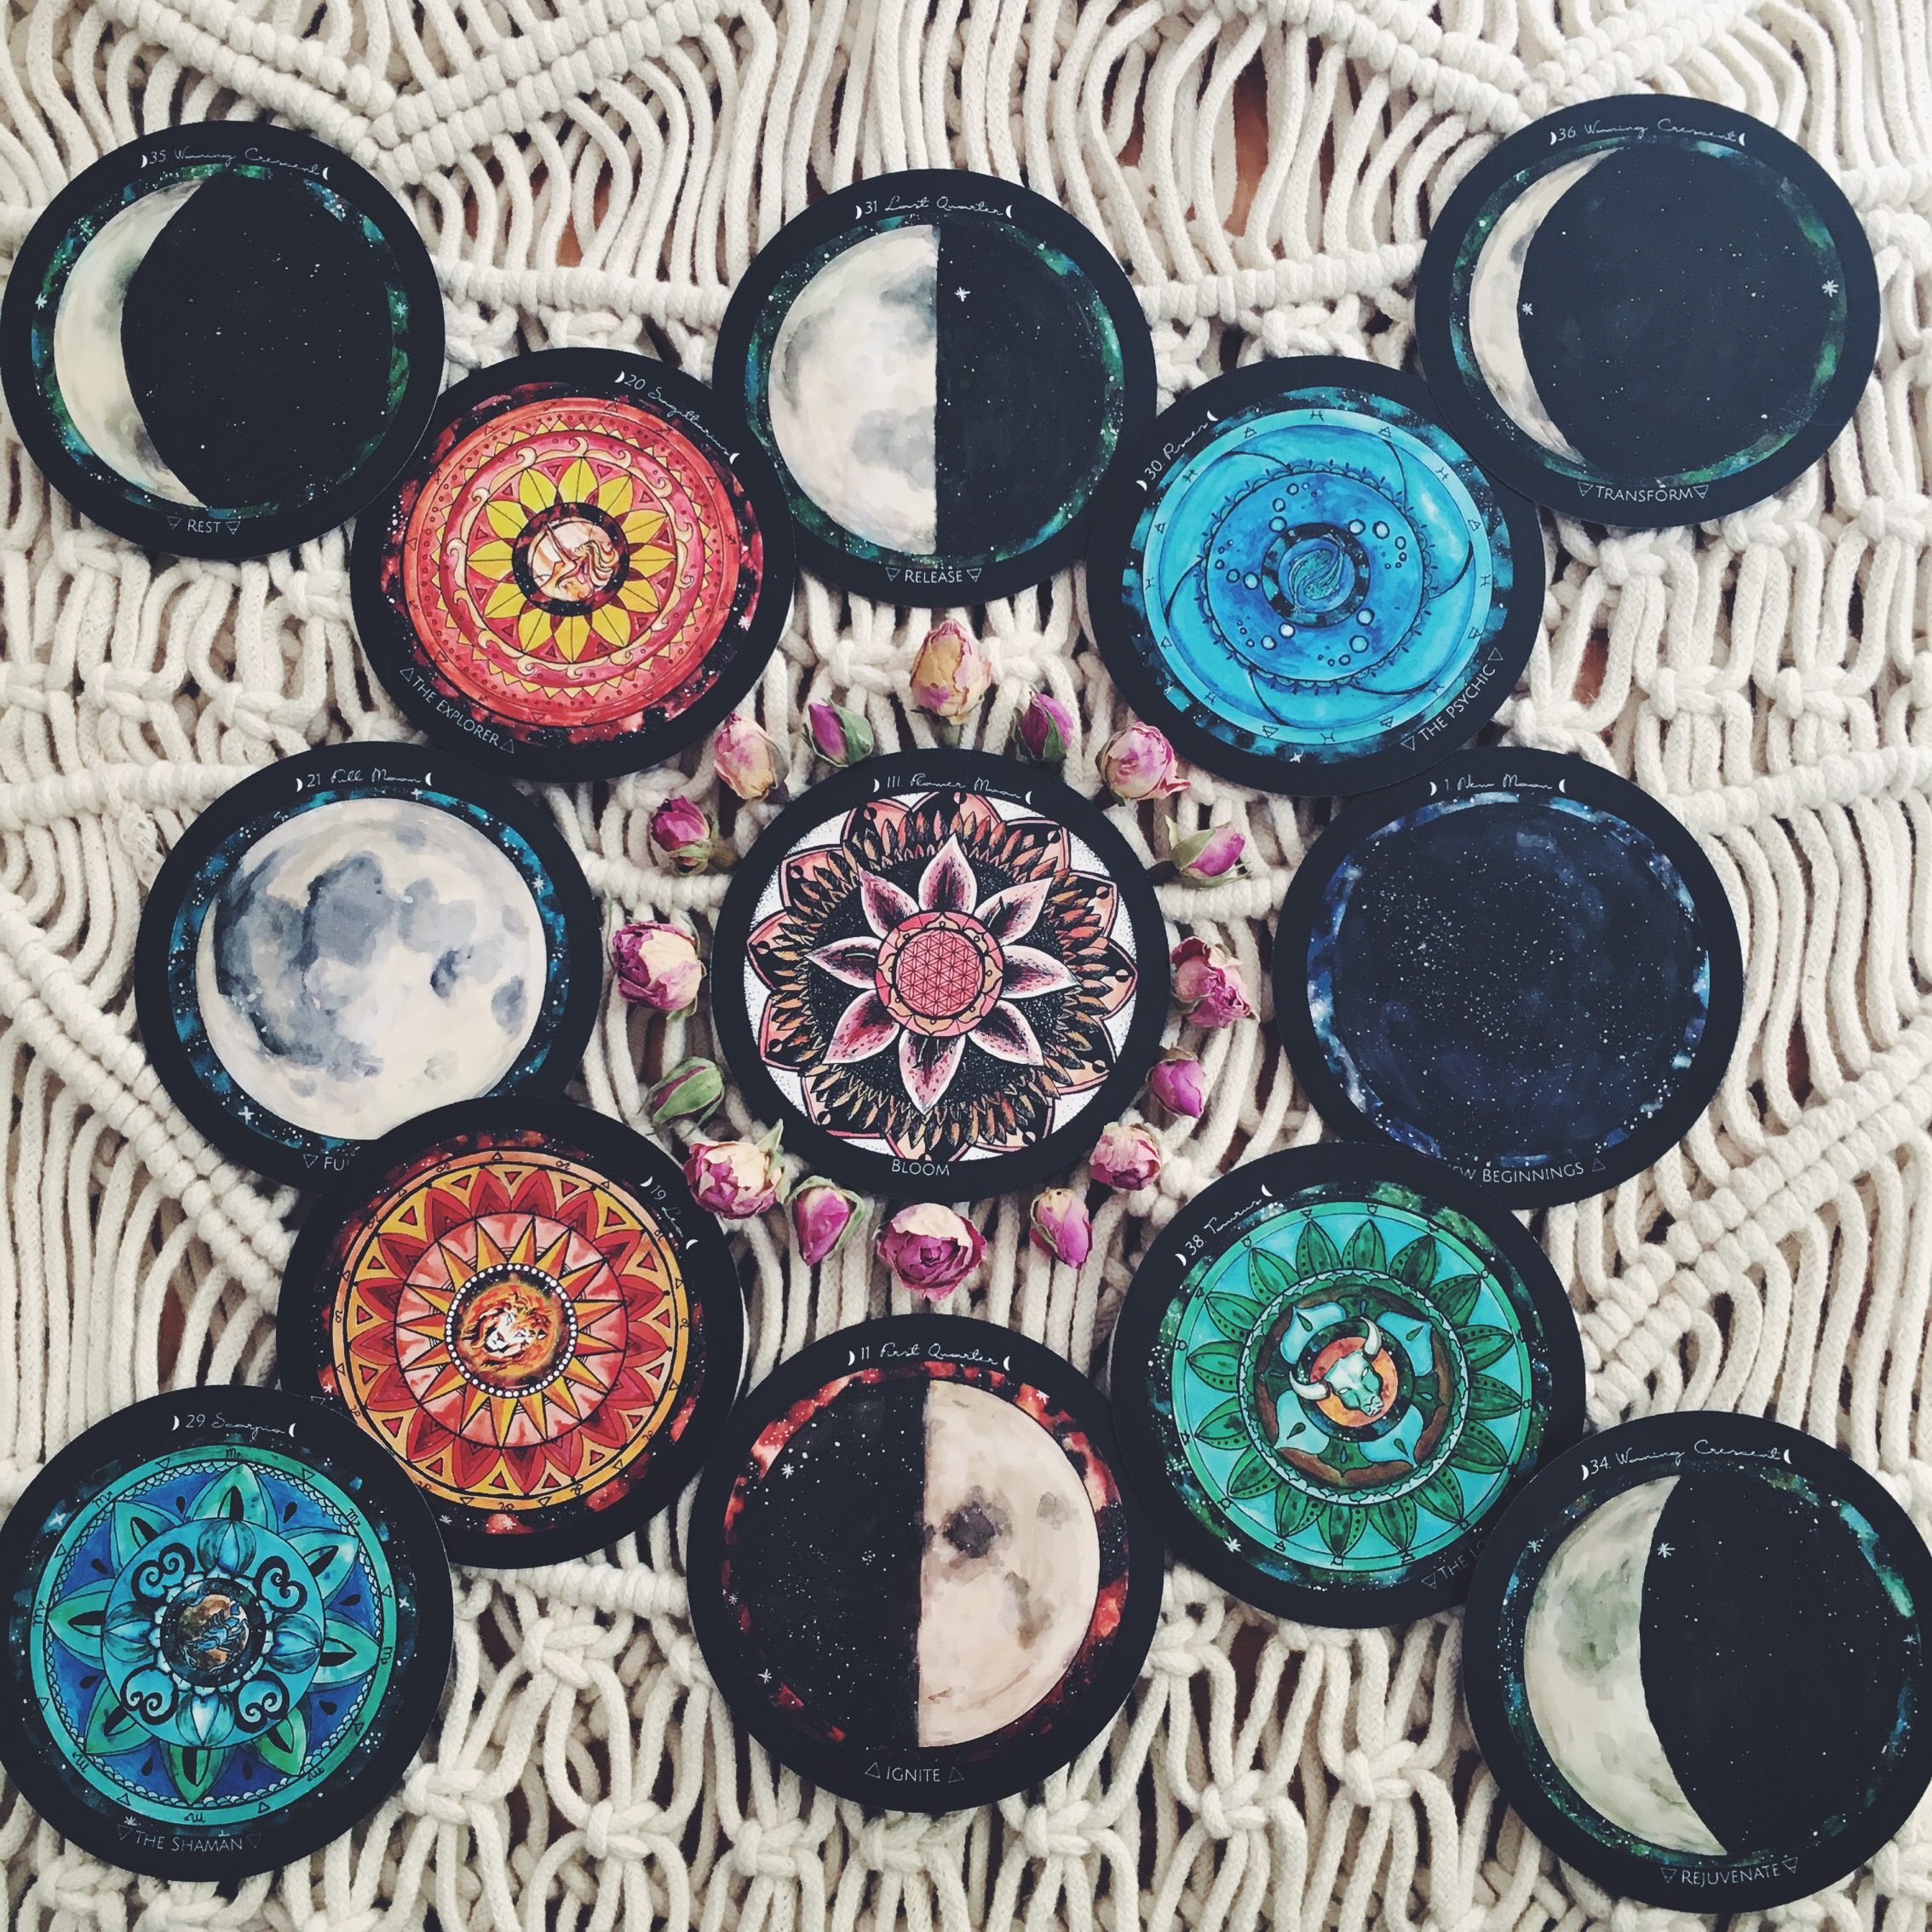 Flower Moon reading - Spirit de la Lune